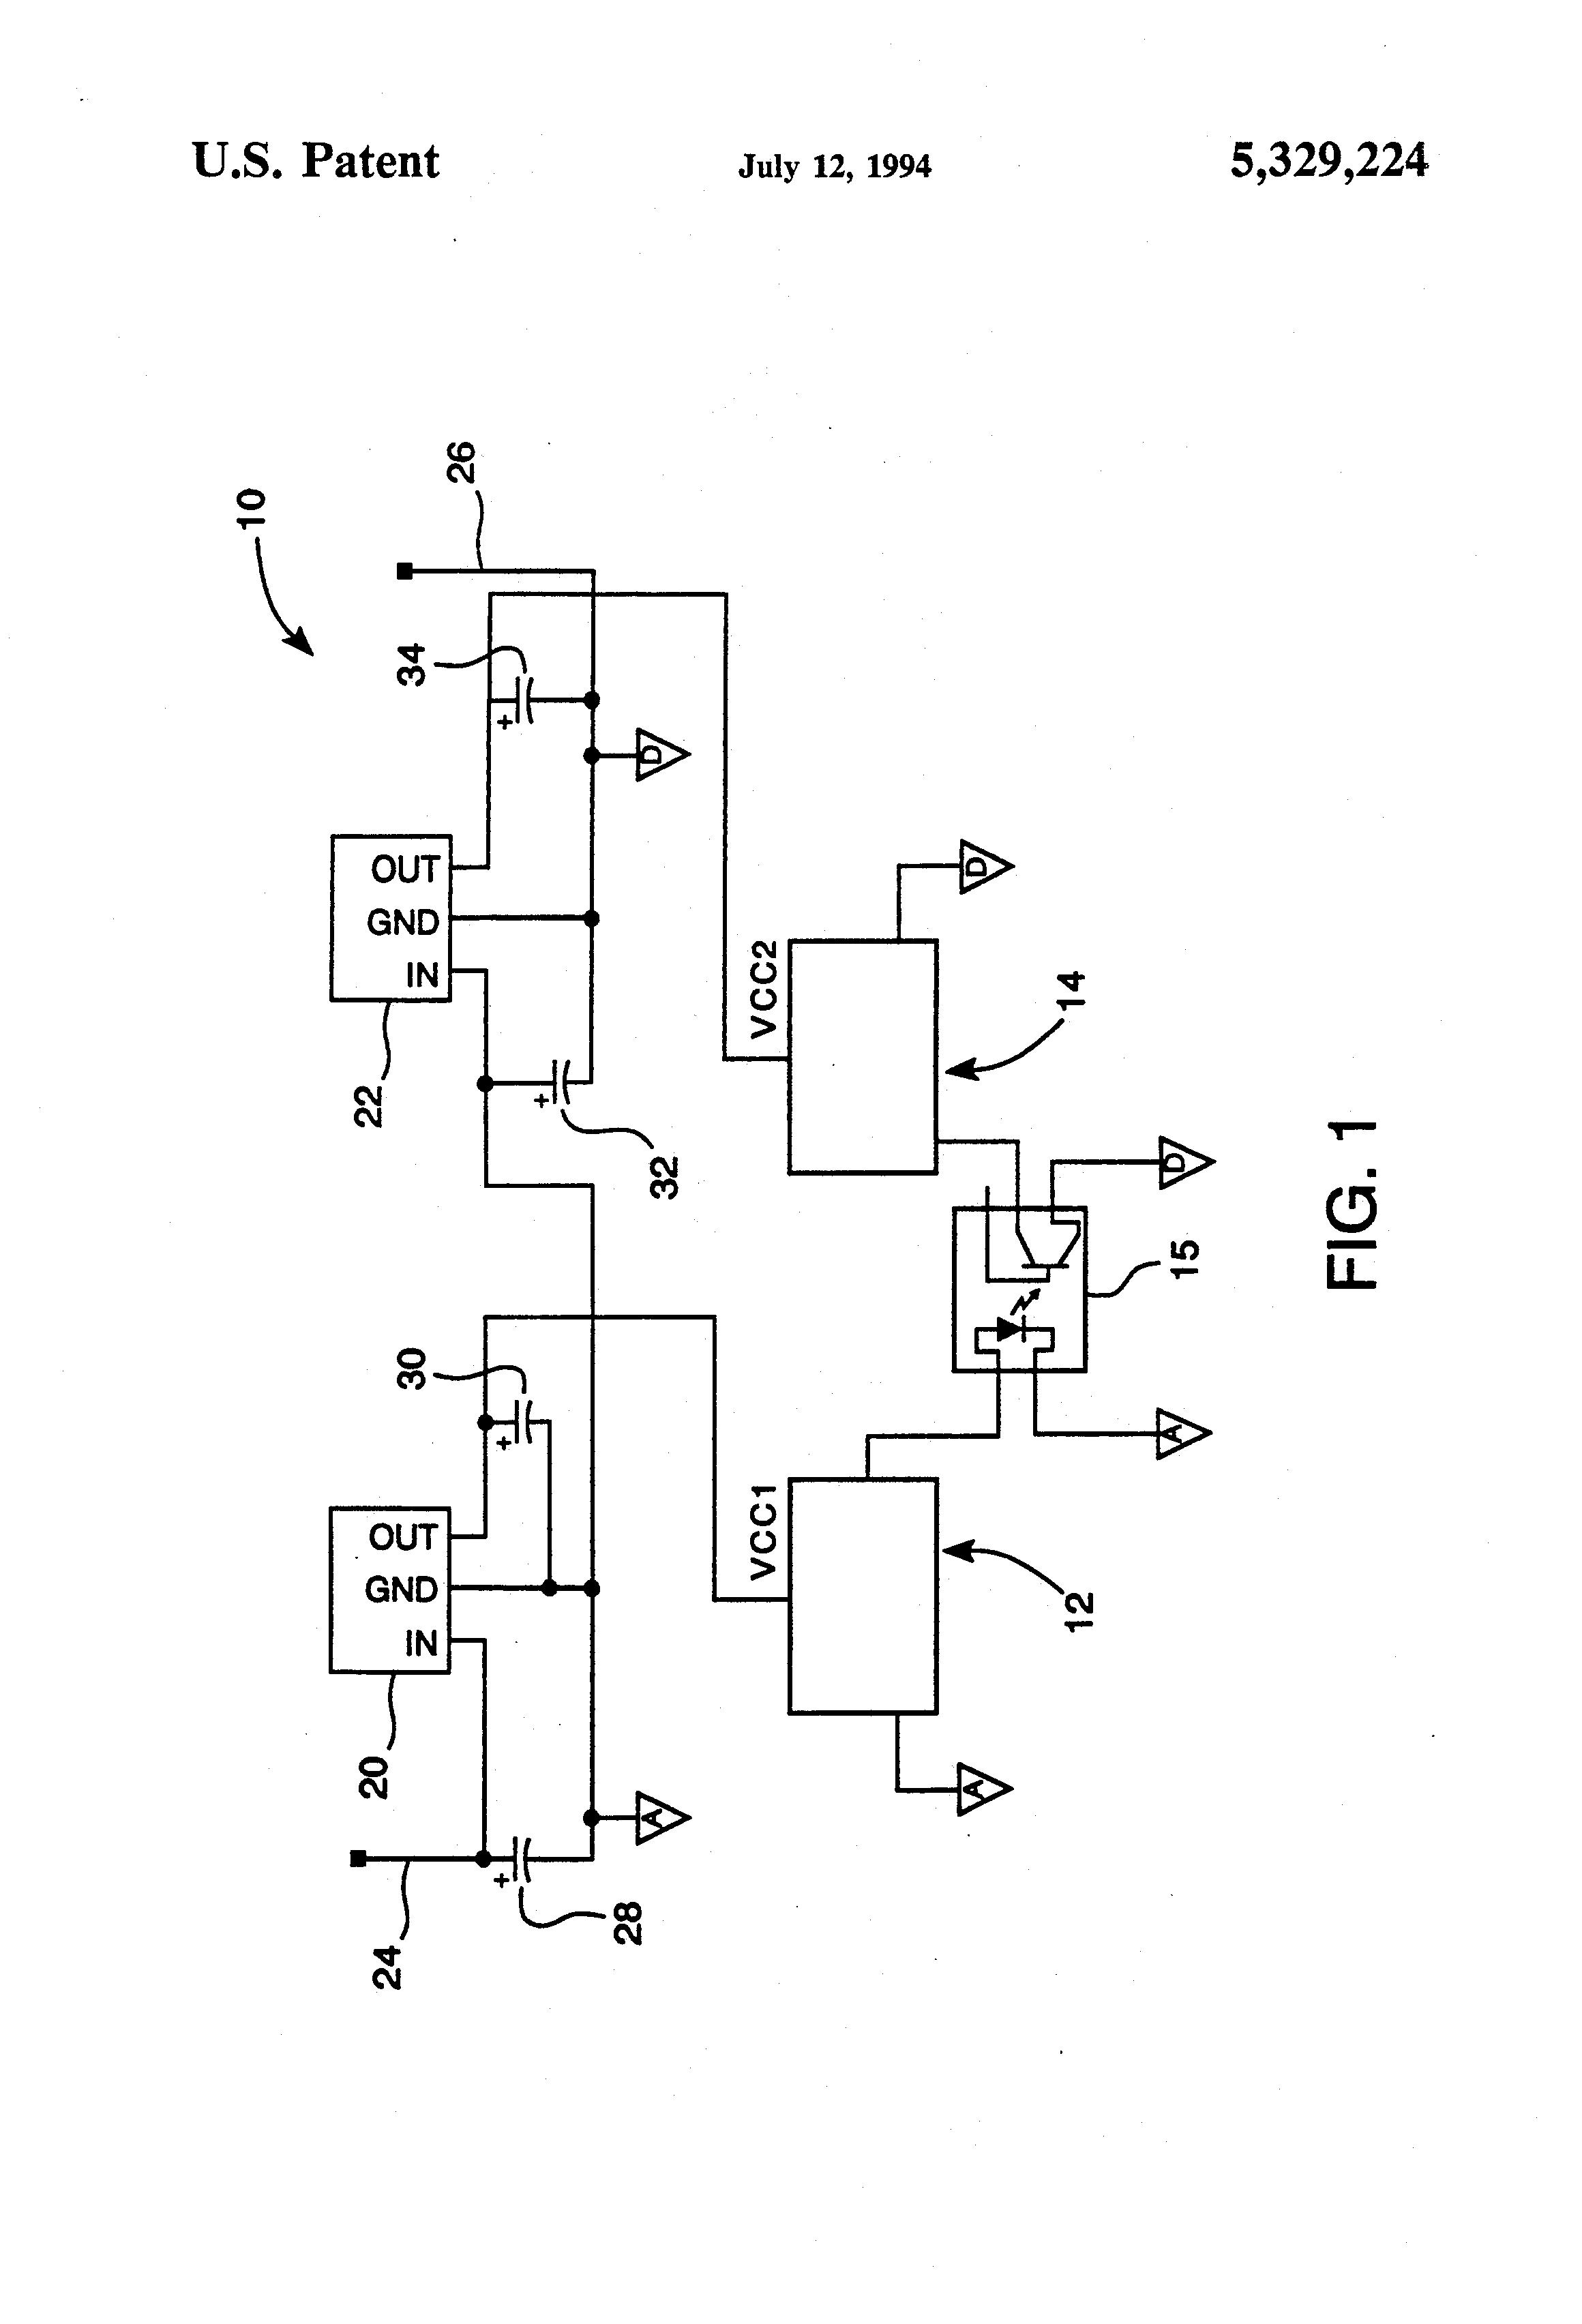 Pictures Of Car Voltage Regulator Circuit Circuits Patent Us5329224 Automotive